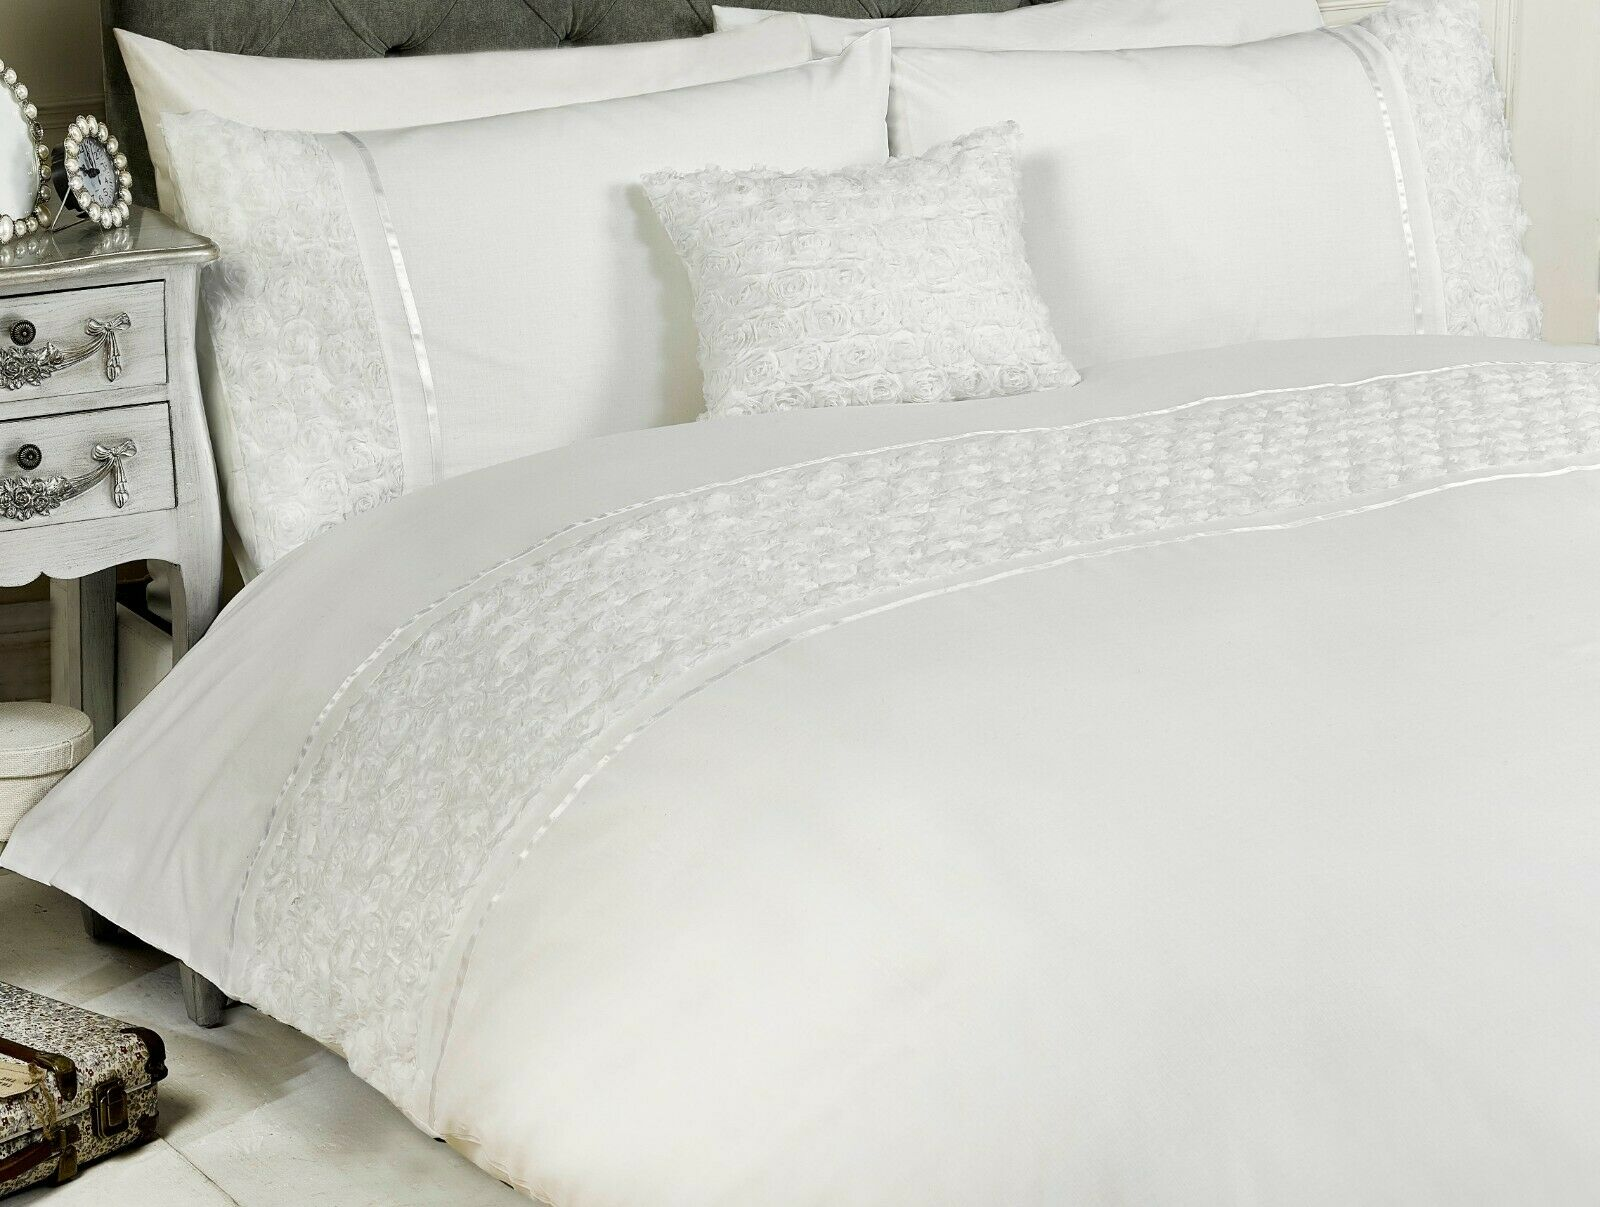 "d843c70600fc Rapport ""Limoges"" Rose Ruffles Style Band Duvet Cover Bedding Set White"